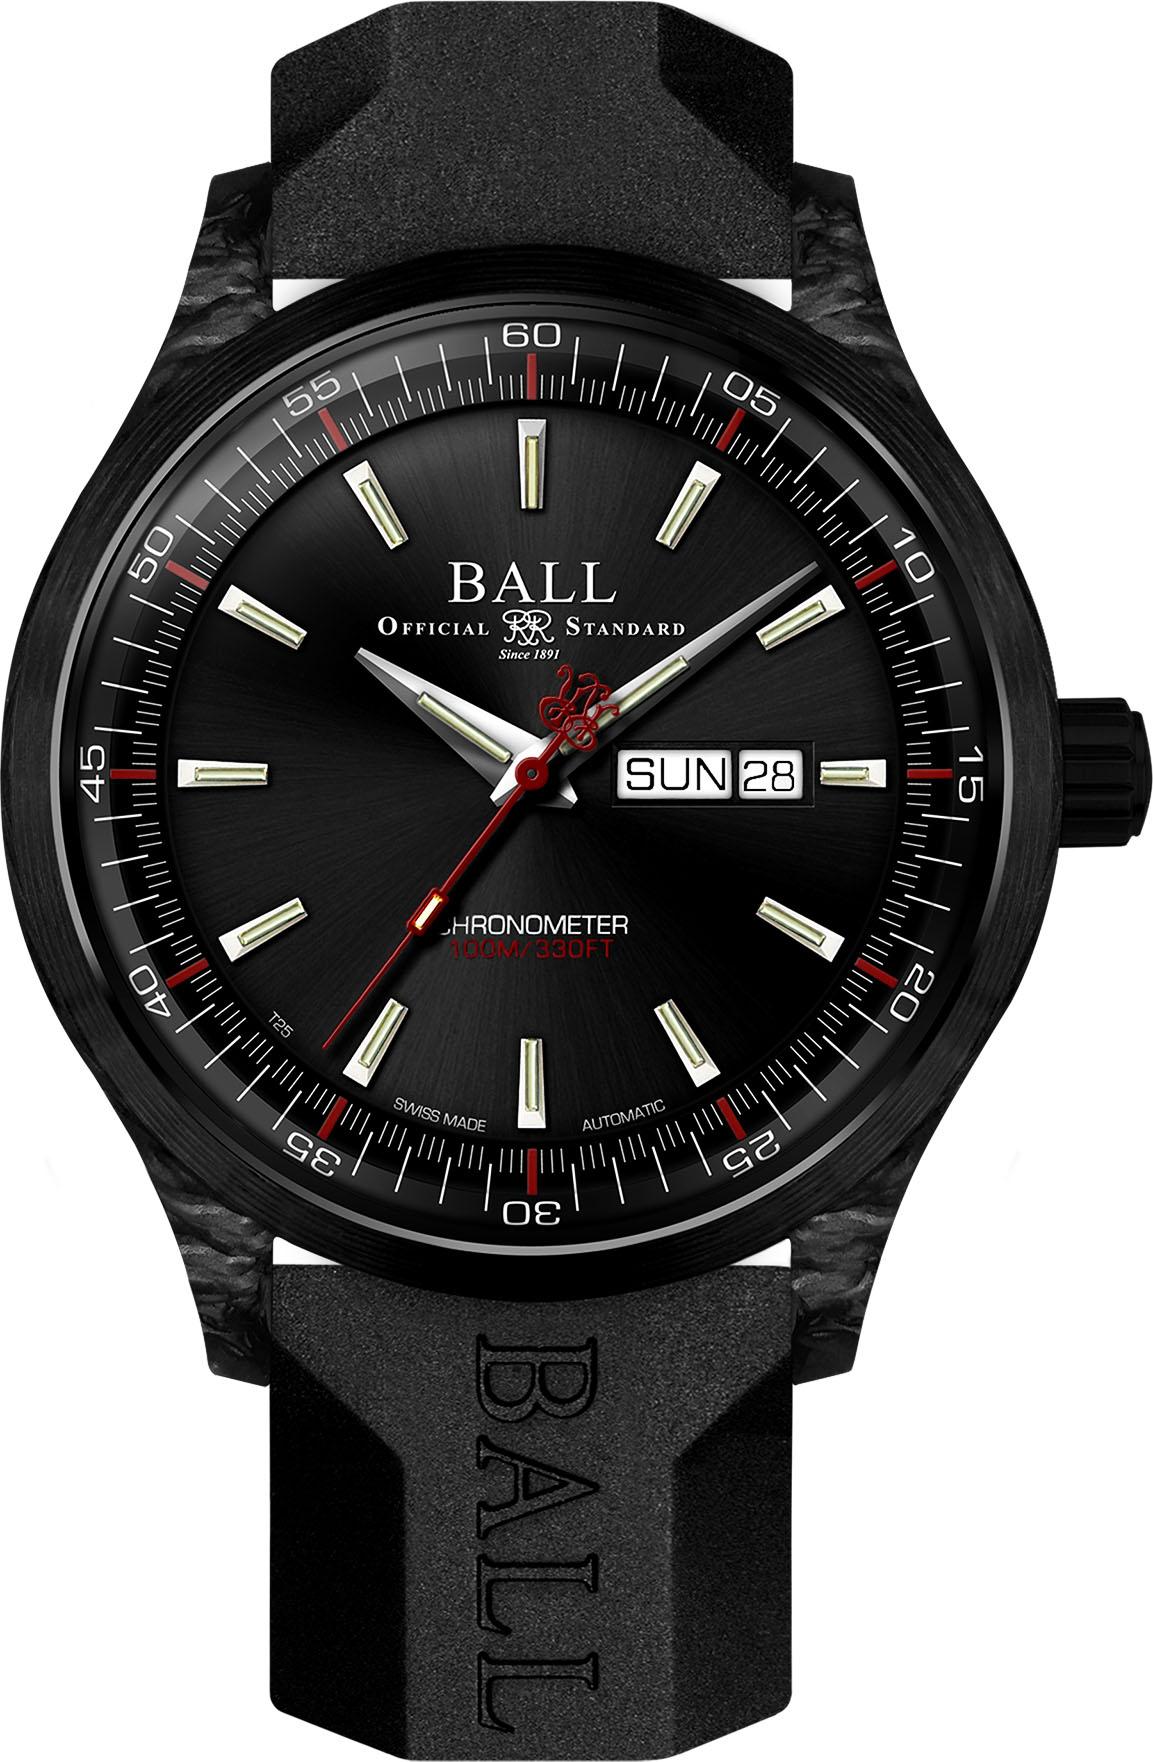 zegarek-meski-ball-engineer-ii-volcano-automatic-chronometer-nm3060c-pcj-gy